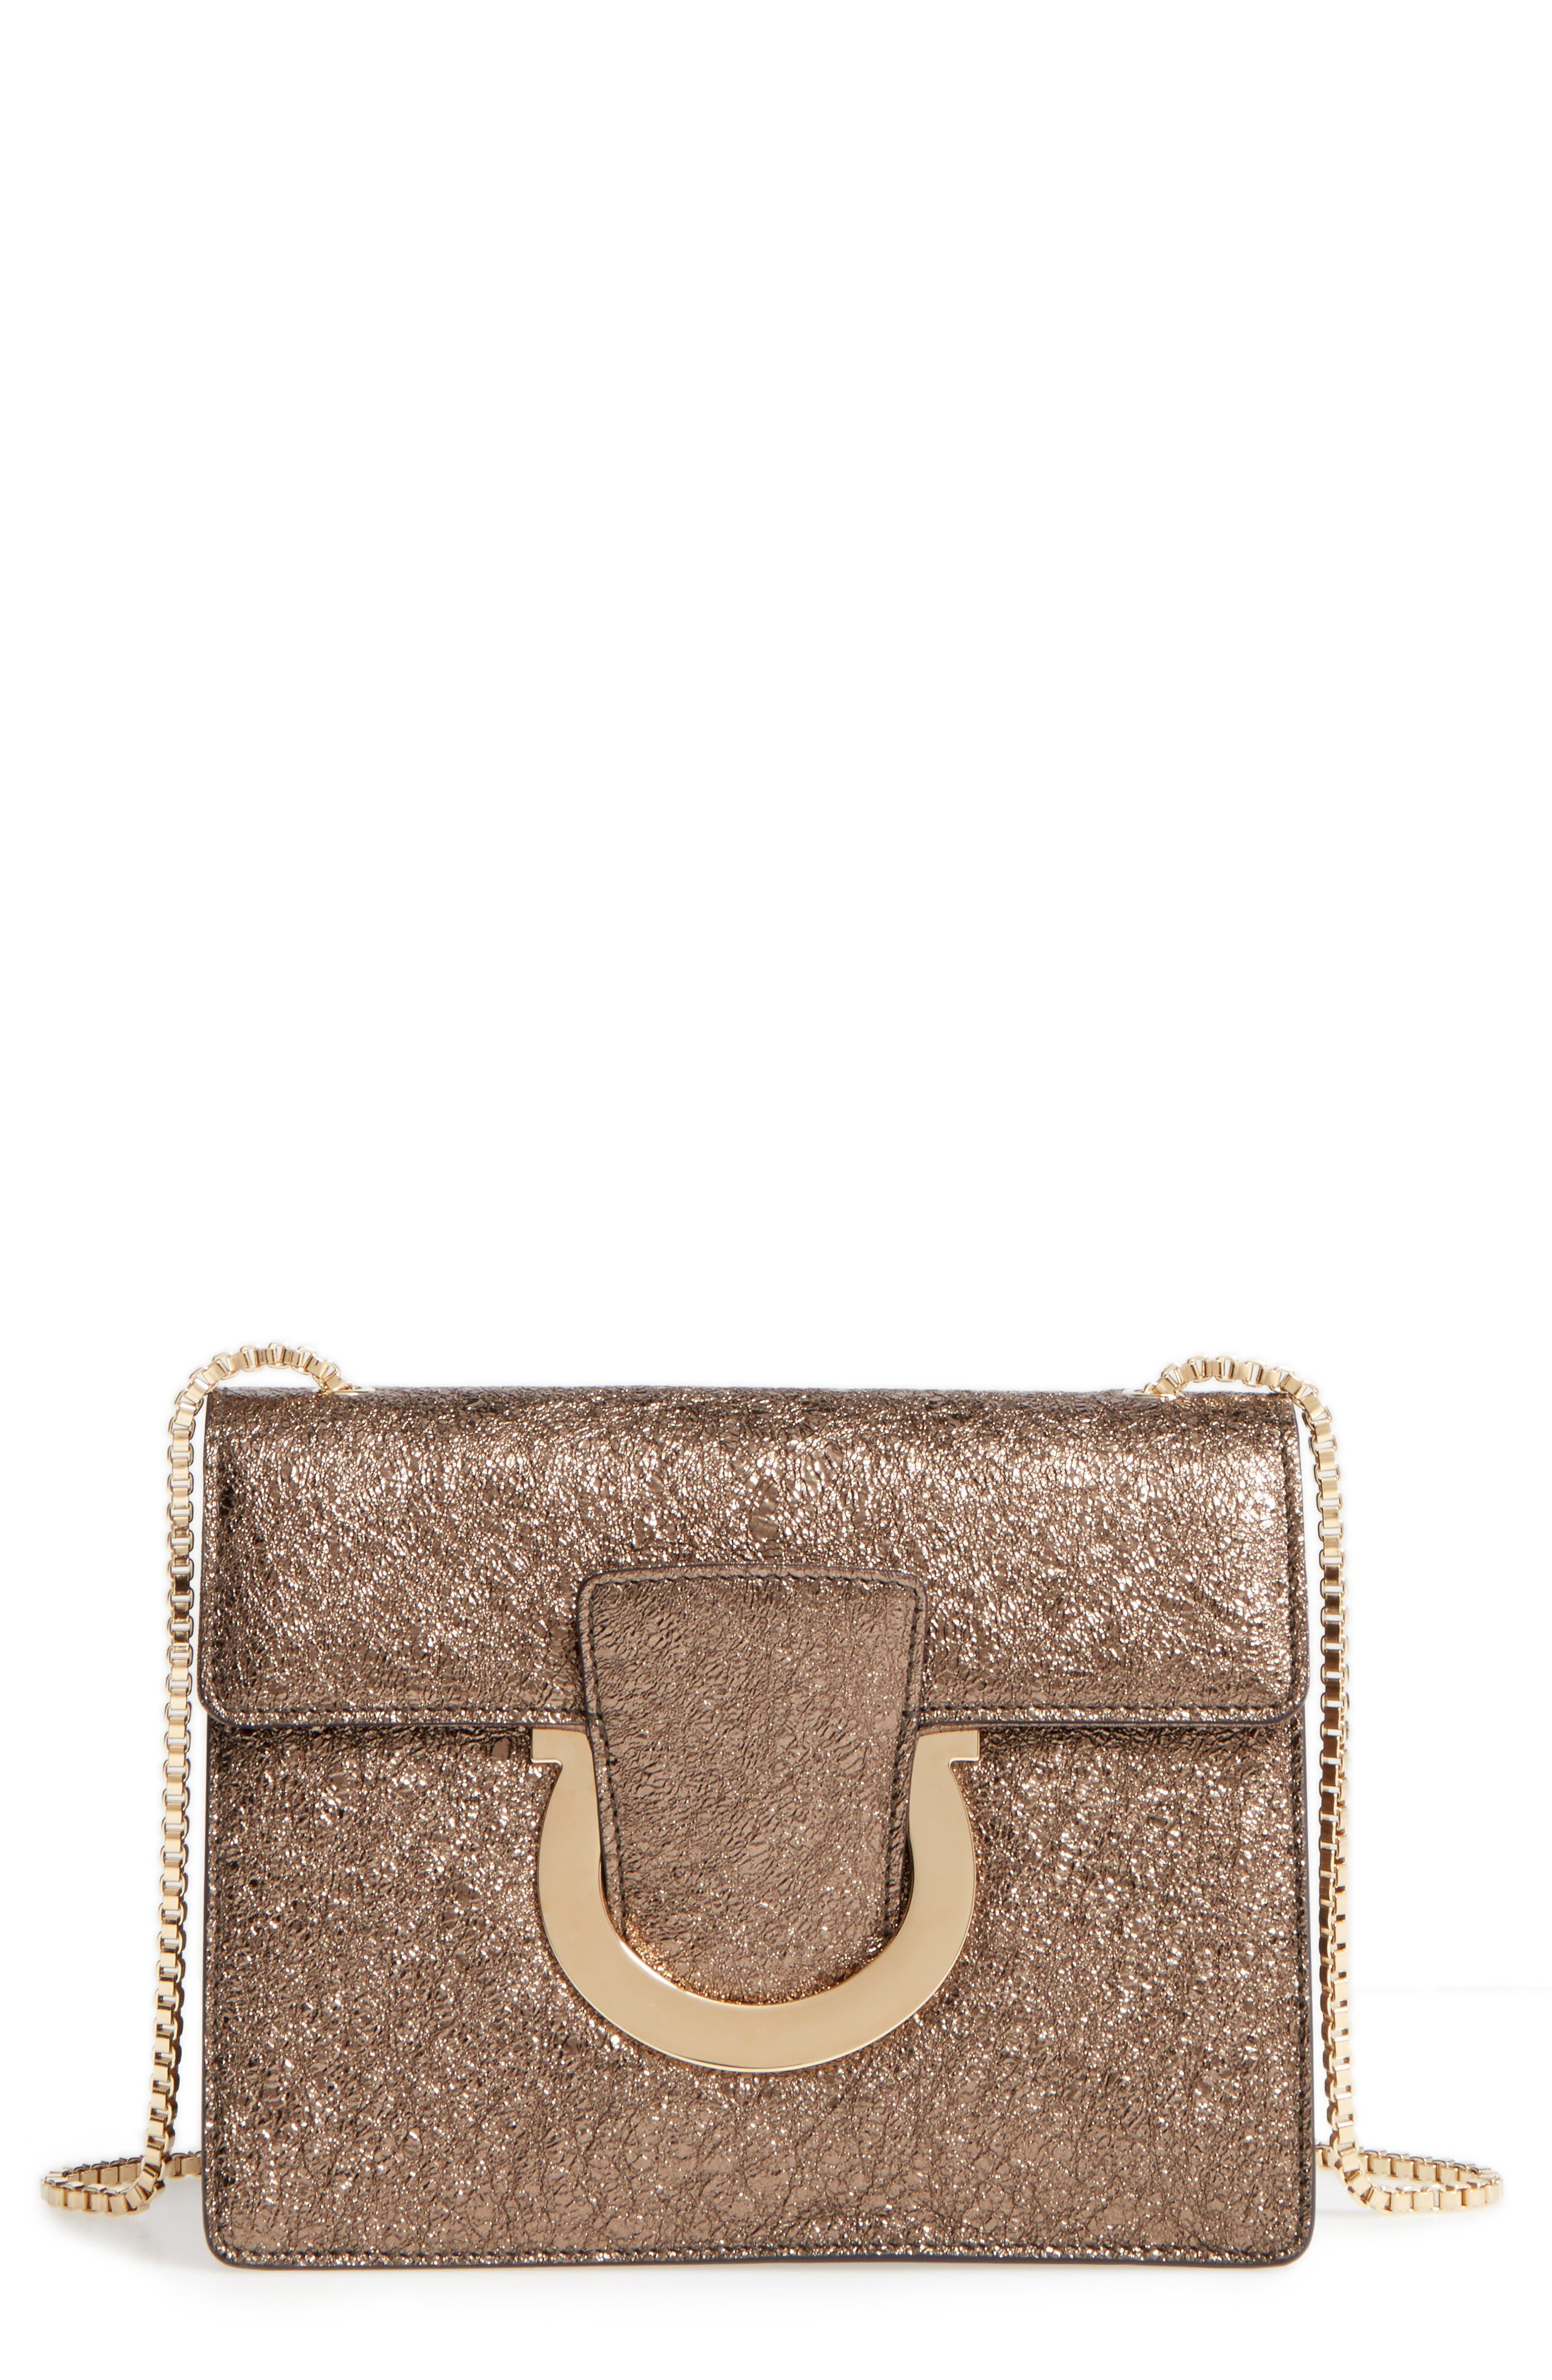 Small Metallic Leather Chain Shoulder Bag,                             Main thumbnail 1, color,